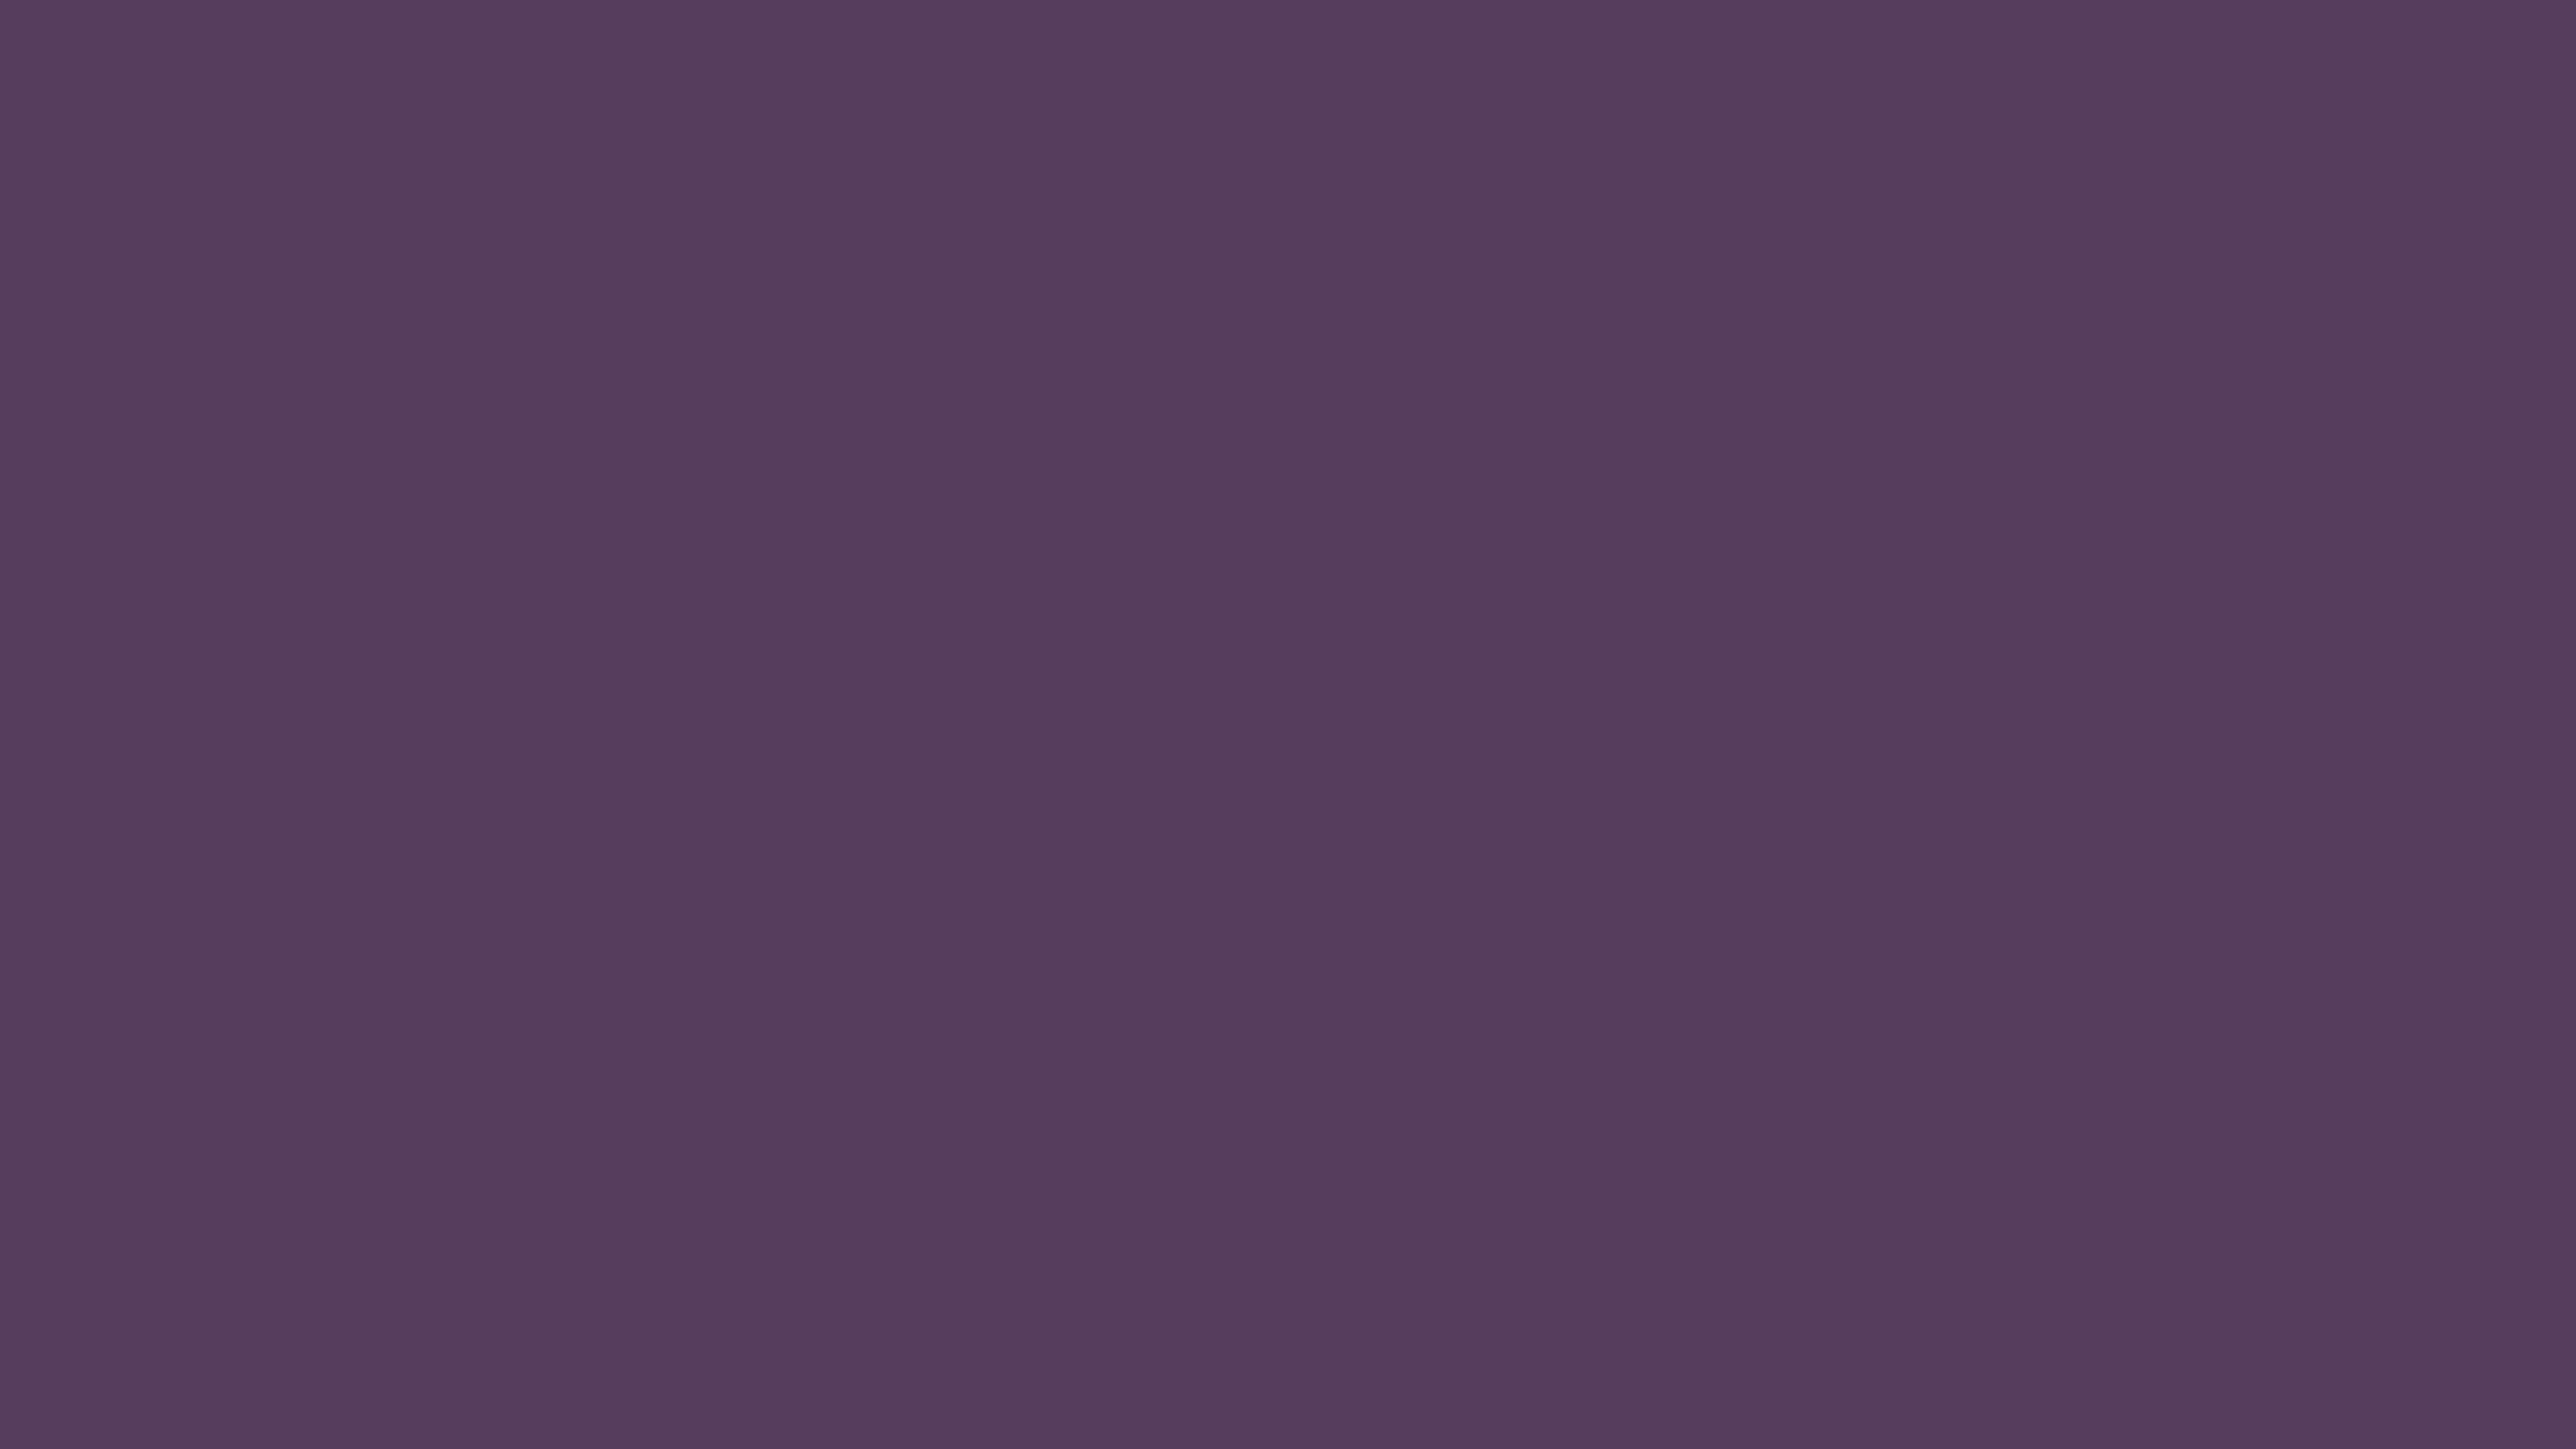 3840x2160 English Violet Solid Color Background